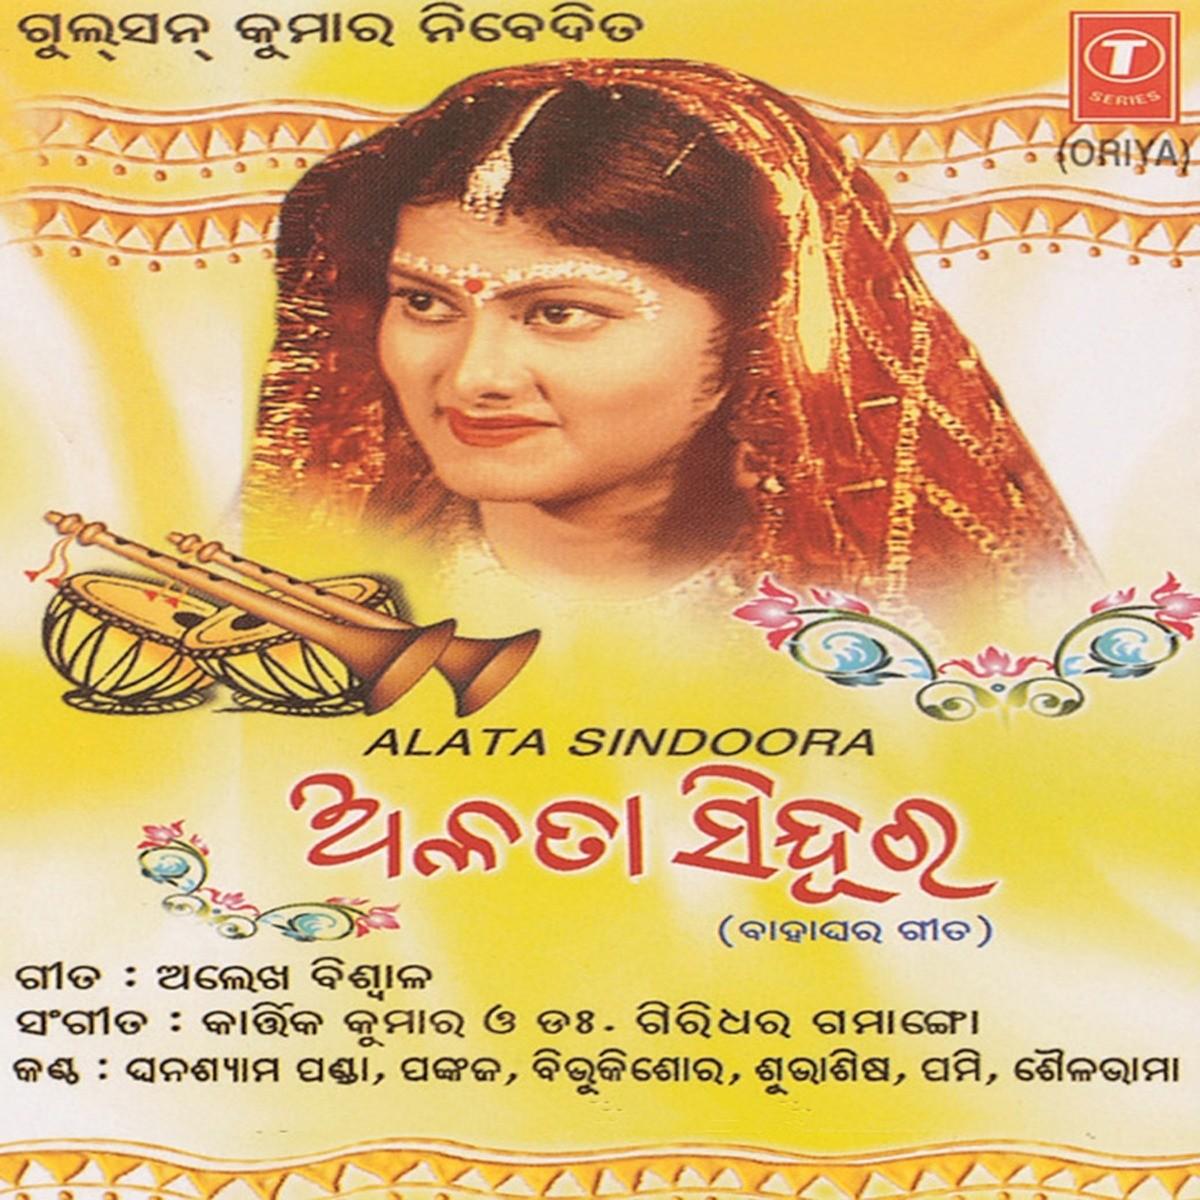 Asini Hori Hilo Gori (Sailabhama)